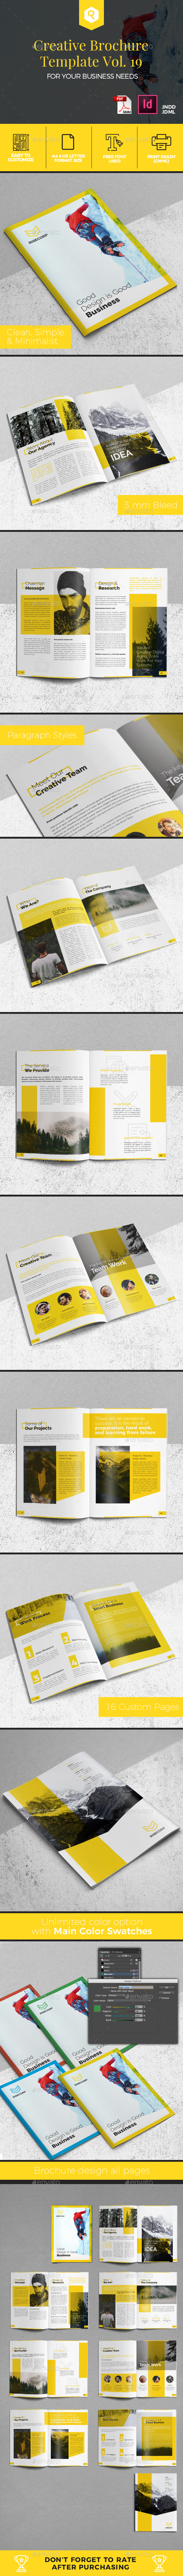 Creative Brochure Template Vol. 19 - Corporate Brochures